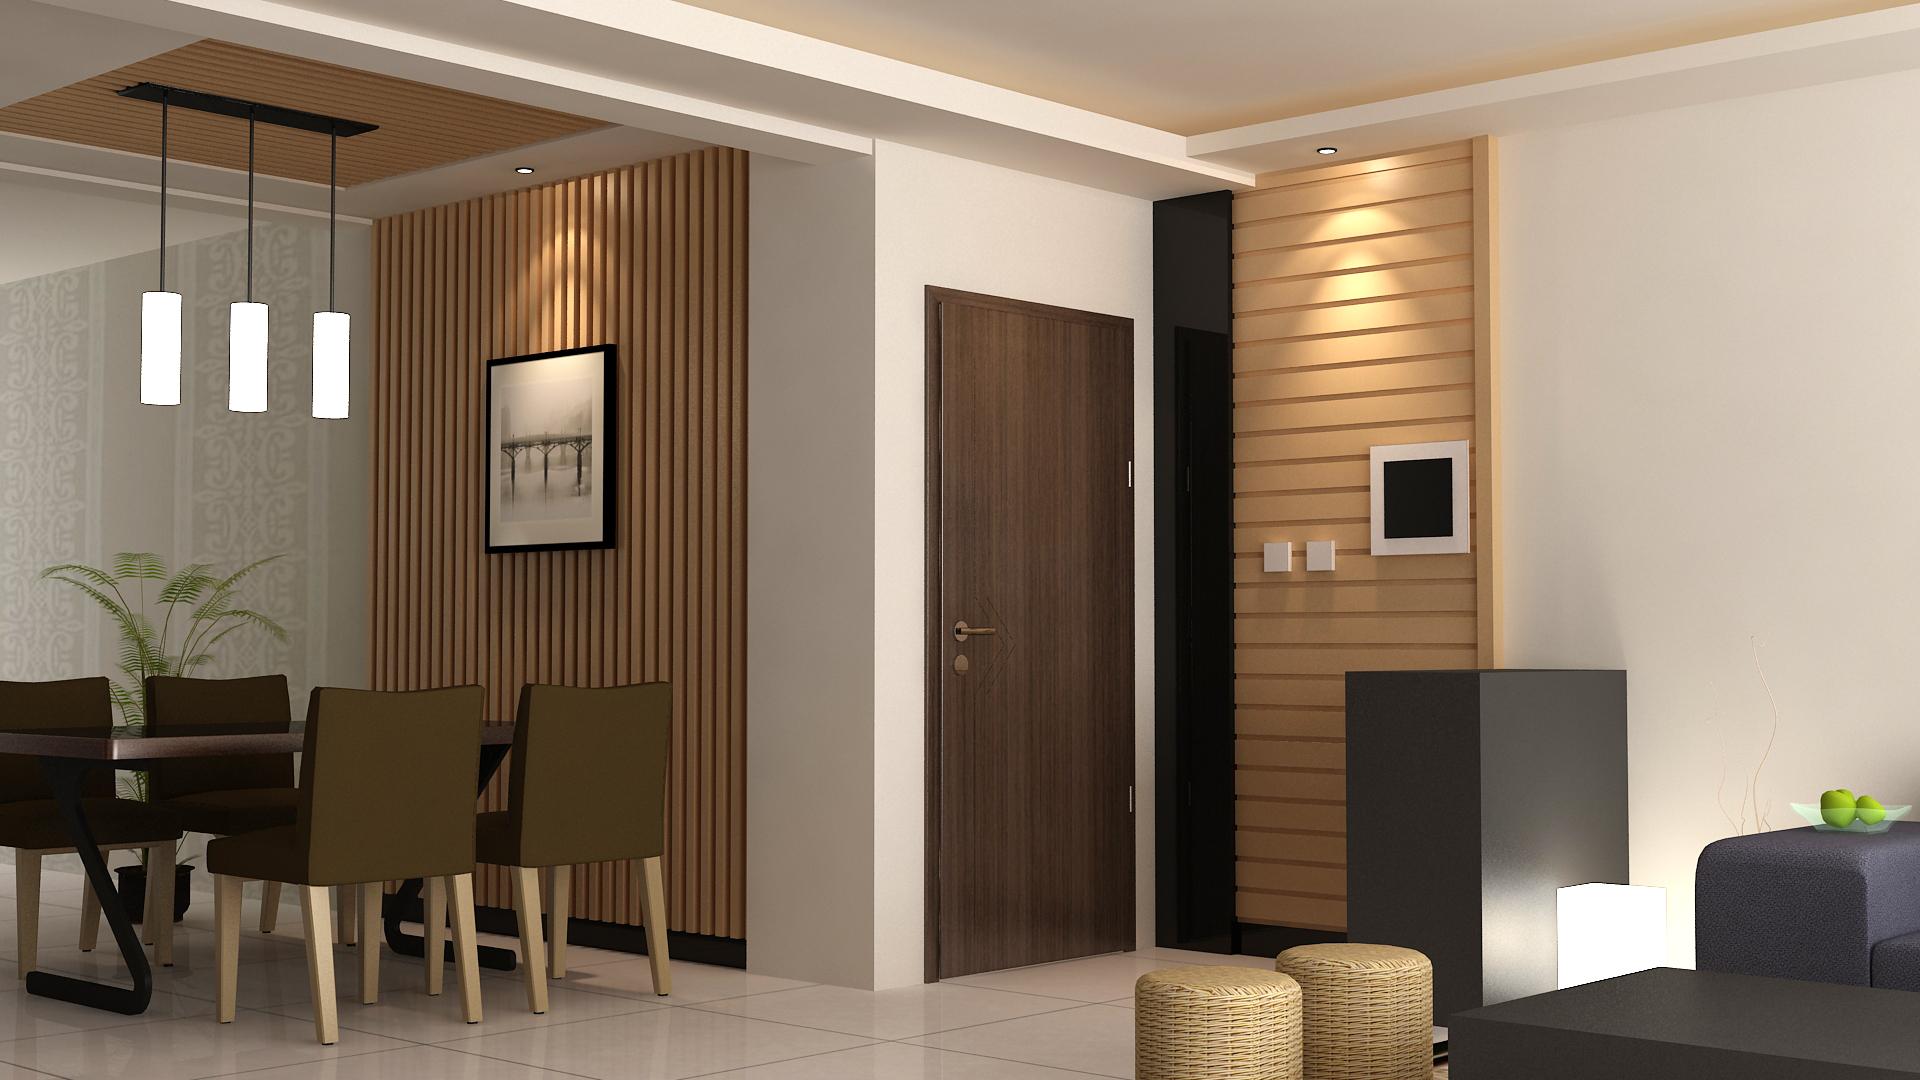 developing-wood-plastic-wall-panel